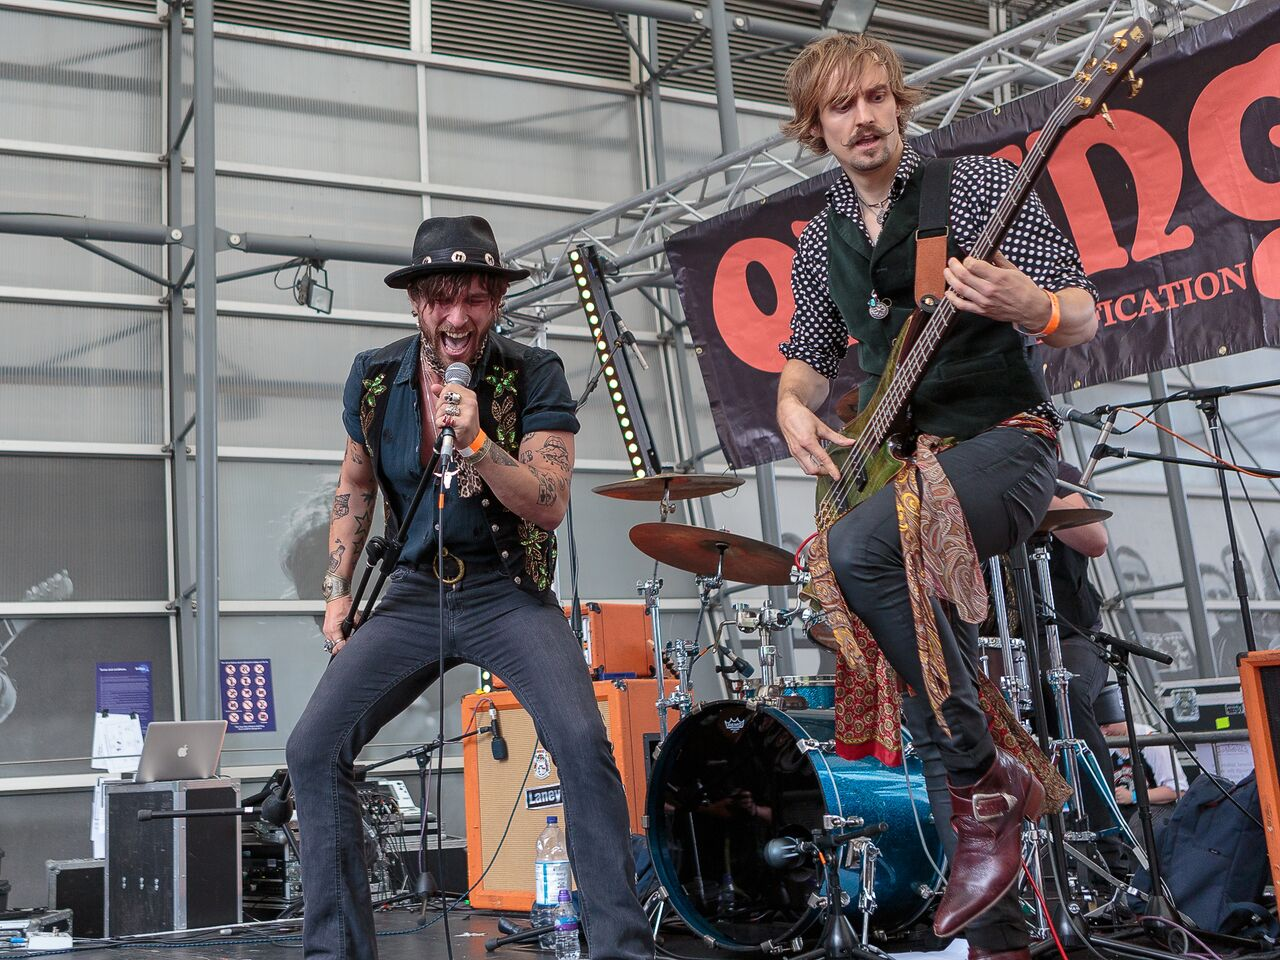 Dirty Thrills - STONE FREE FESTIVAL, O2, London, 16 June 2018